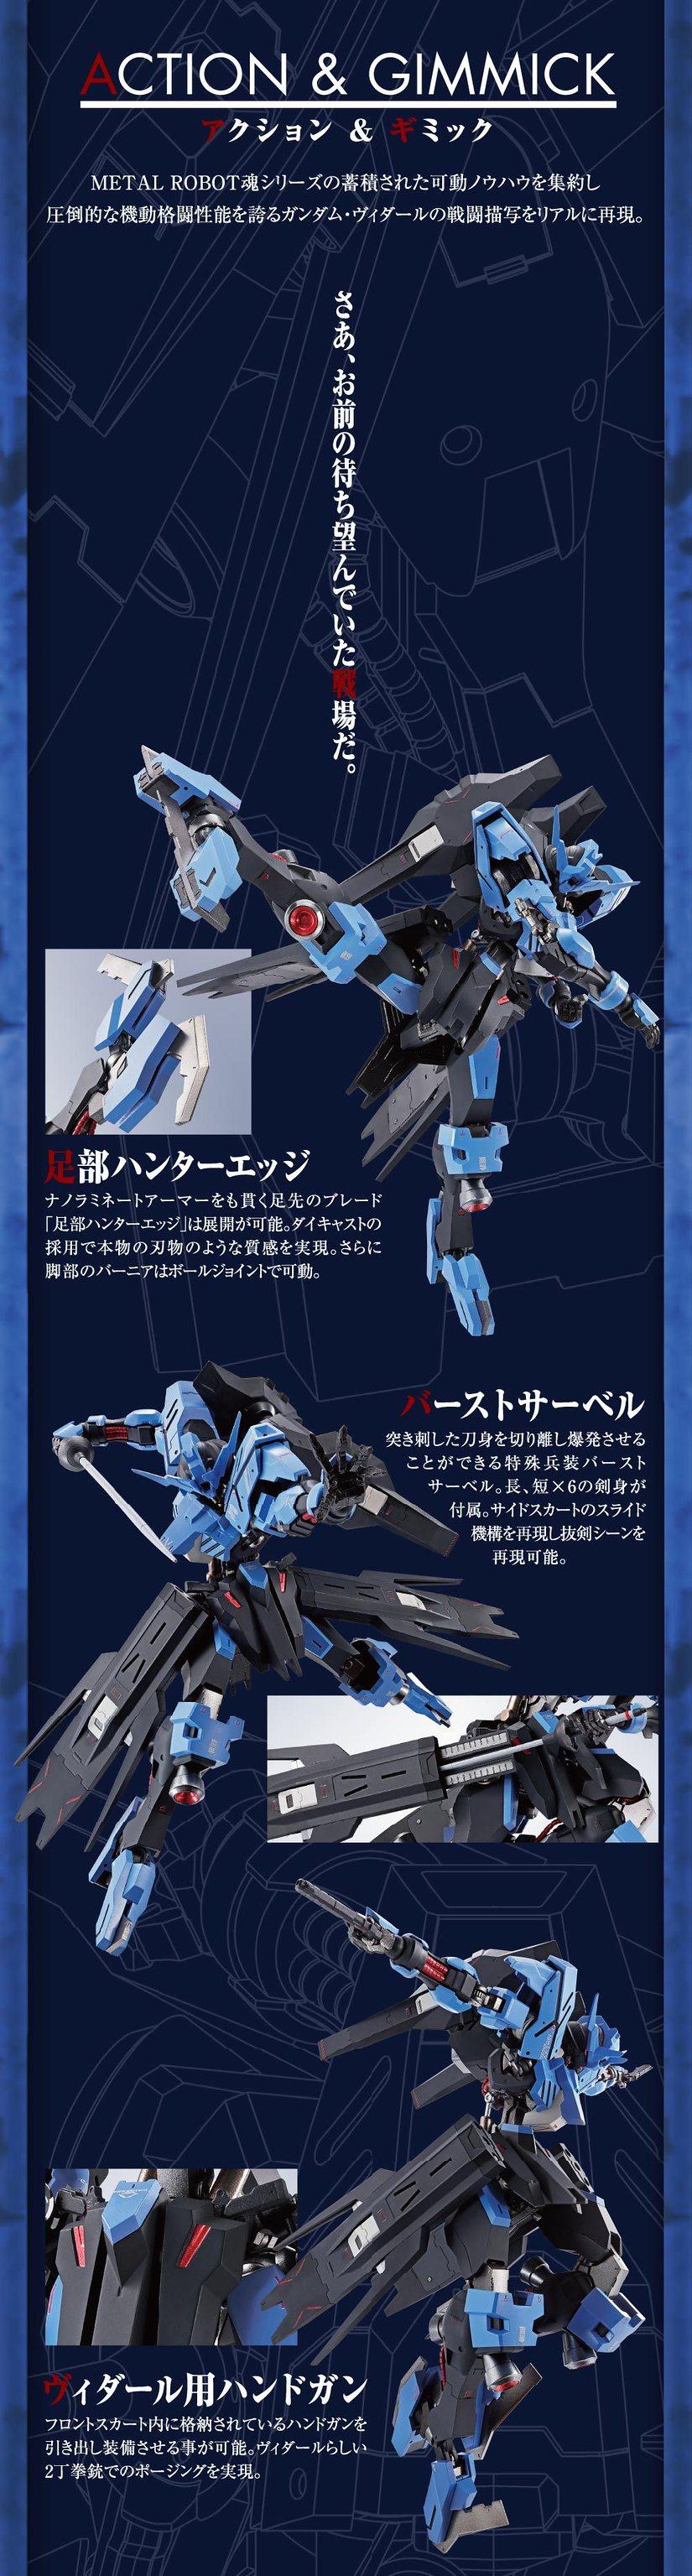 搭載「阿頼耶識TypeE」的那架機體即將登場!METAL ROBOT魂《機動戰士鋼彈 鐵血孤兒》ASW-G-XX 殘命鋼彈(ガンダムヴィダール)